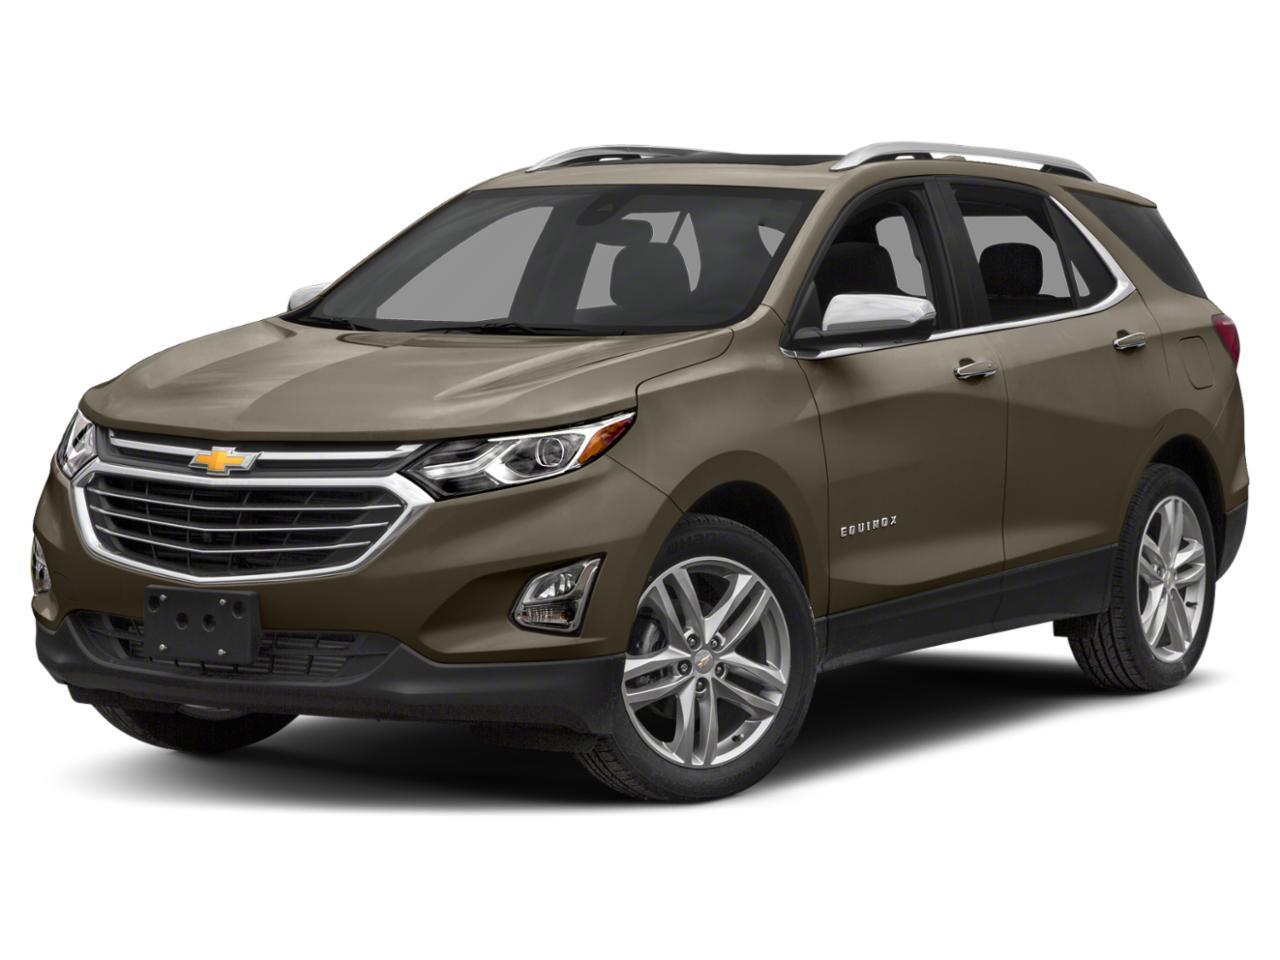 2018 Chevrolet Equinox Vehicle Photo in MENOMONIE, WI 54751-1341